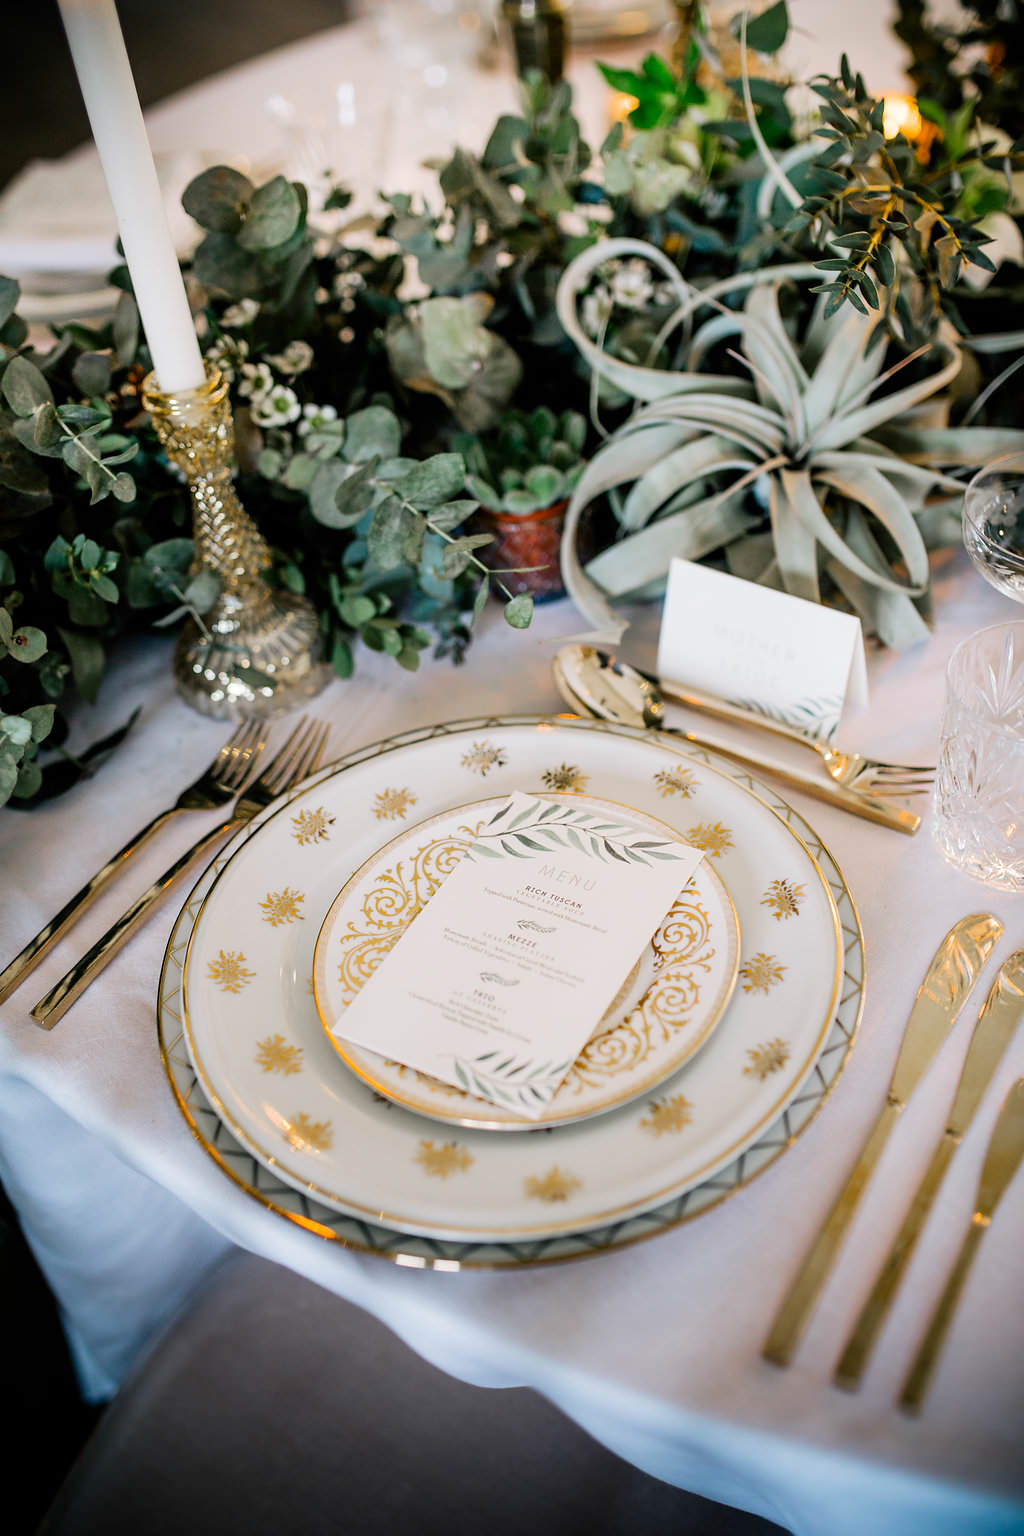 Place Setting Gold Cutlery Plates Lapstone Barn Wedding Ideas Cotswolds Katie Hamilton Photography